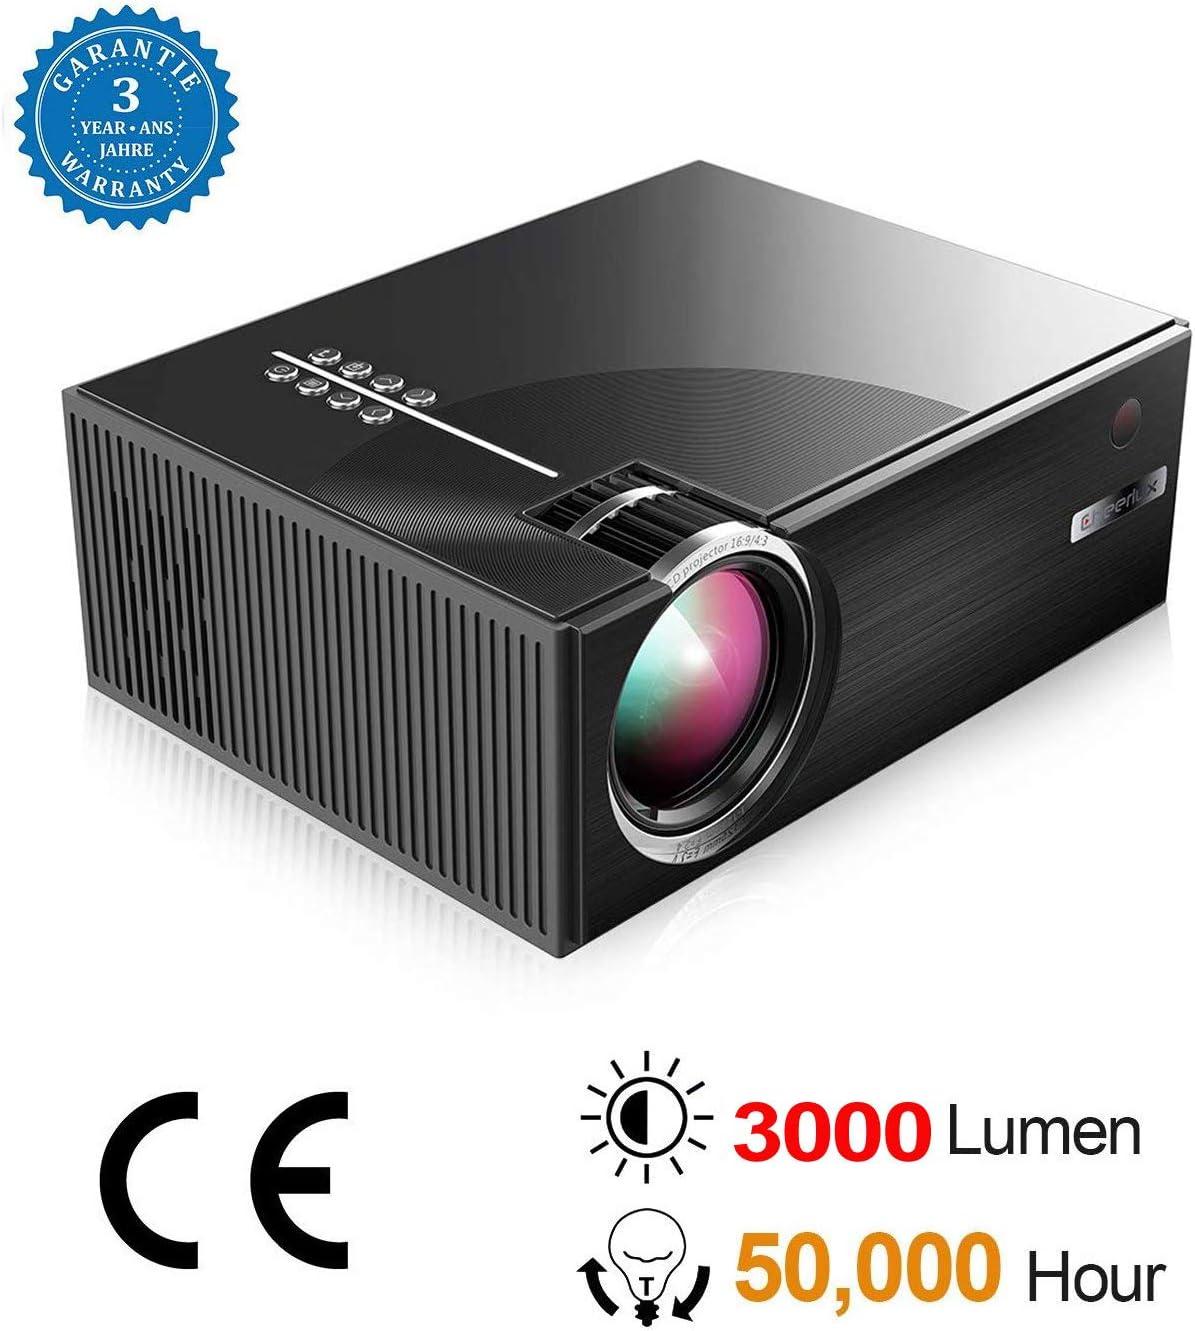 BEYI 3000 Lumen LED Proyector de Video. Proyector PortáTil LCD ...